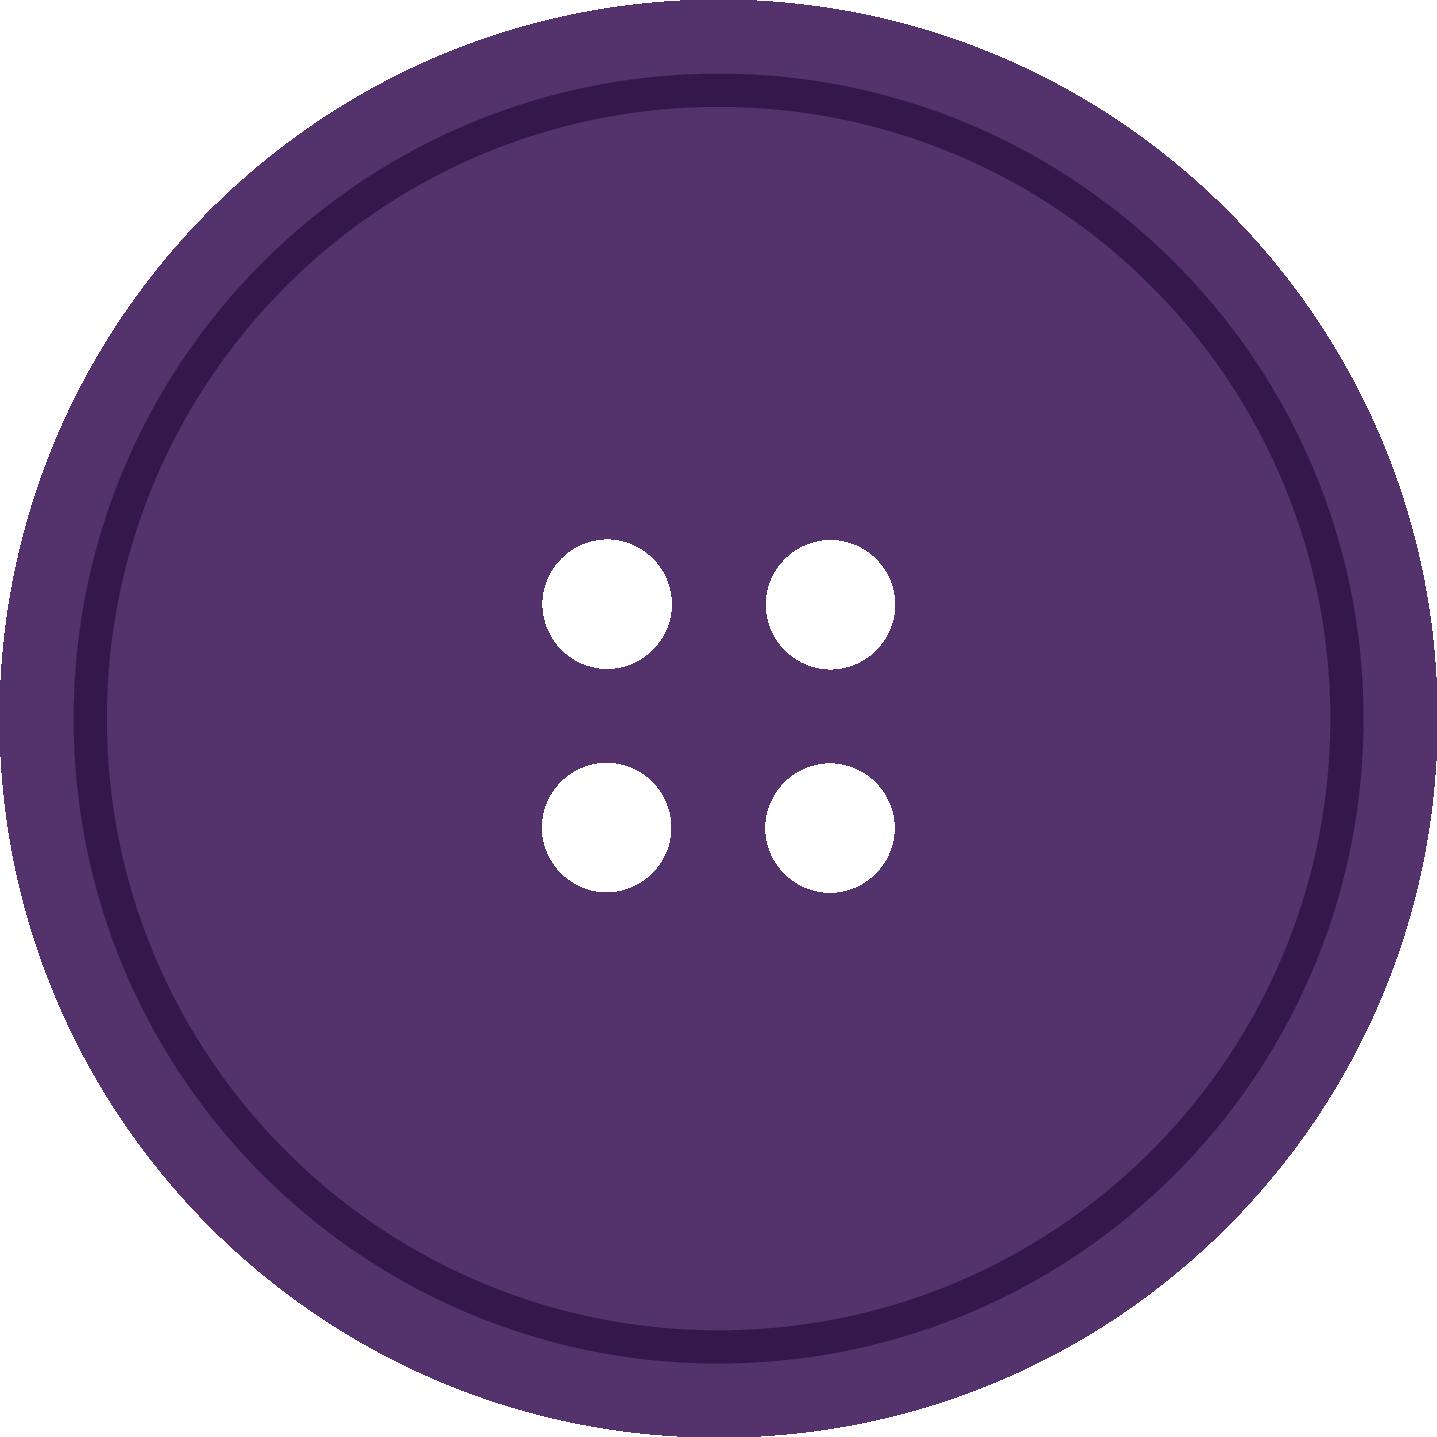 Buttons clipart transparent background. Clothes button png image